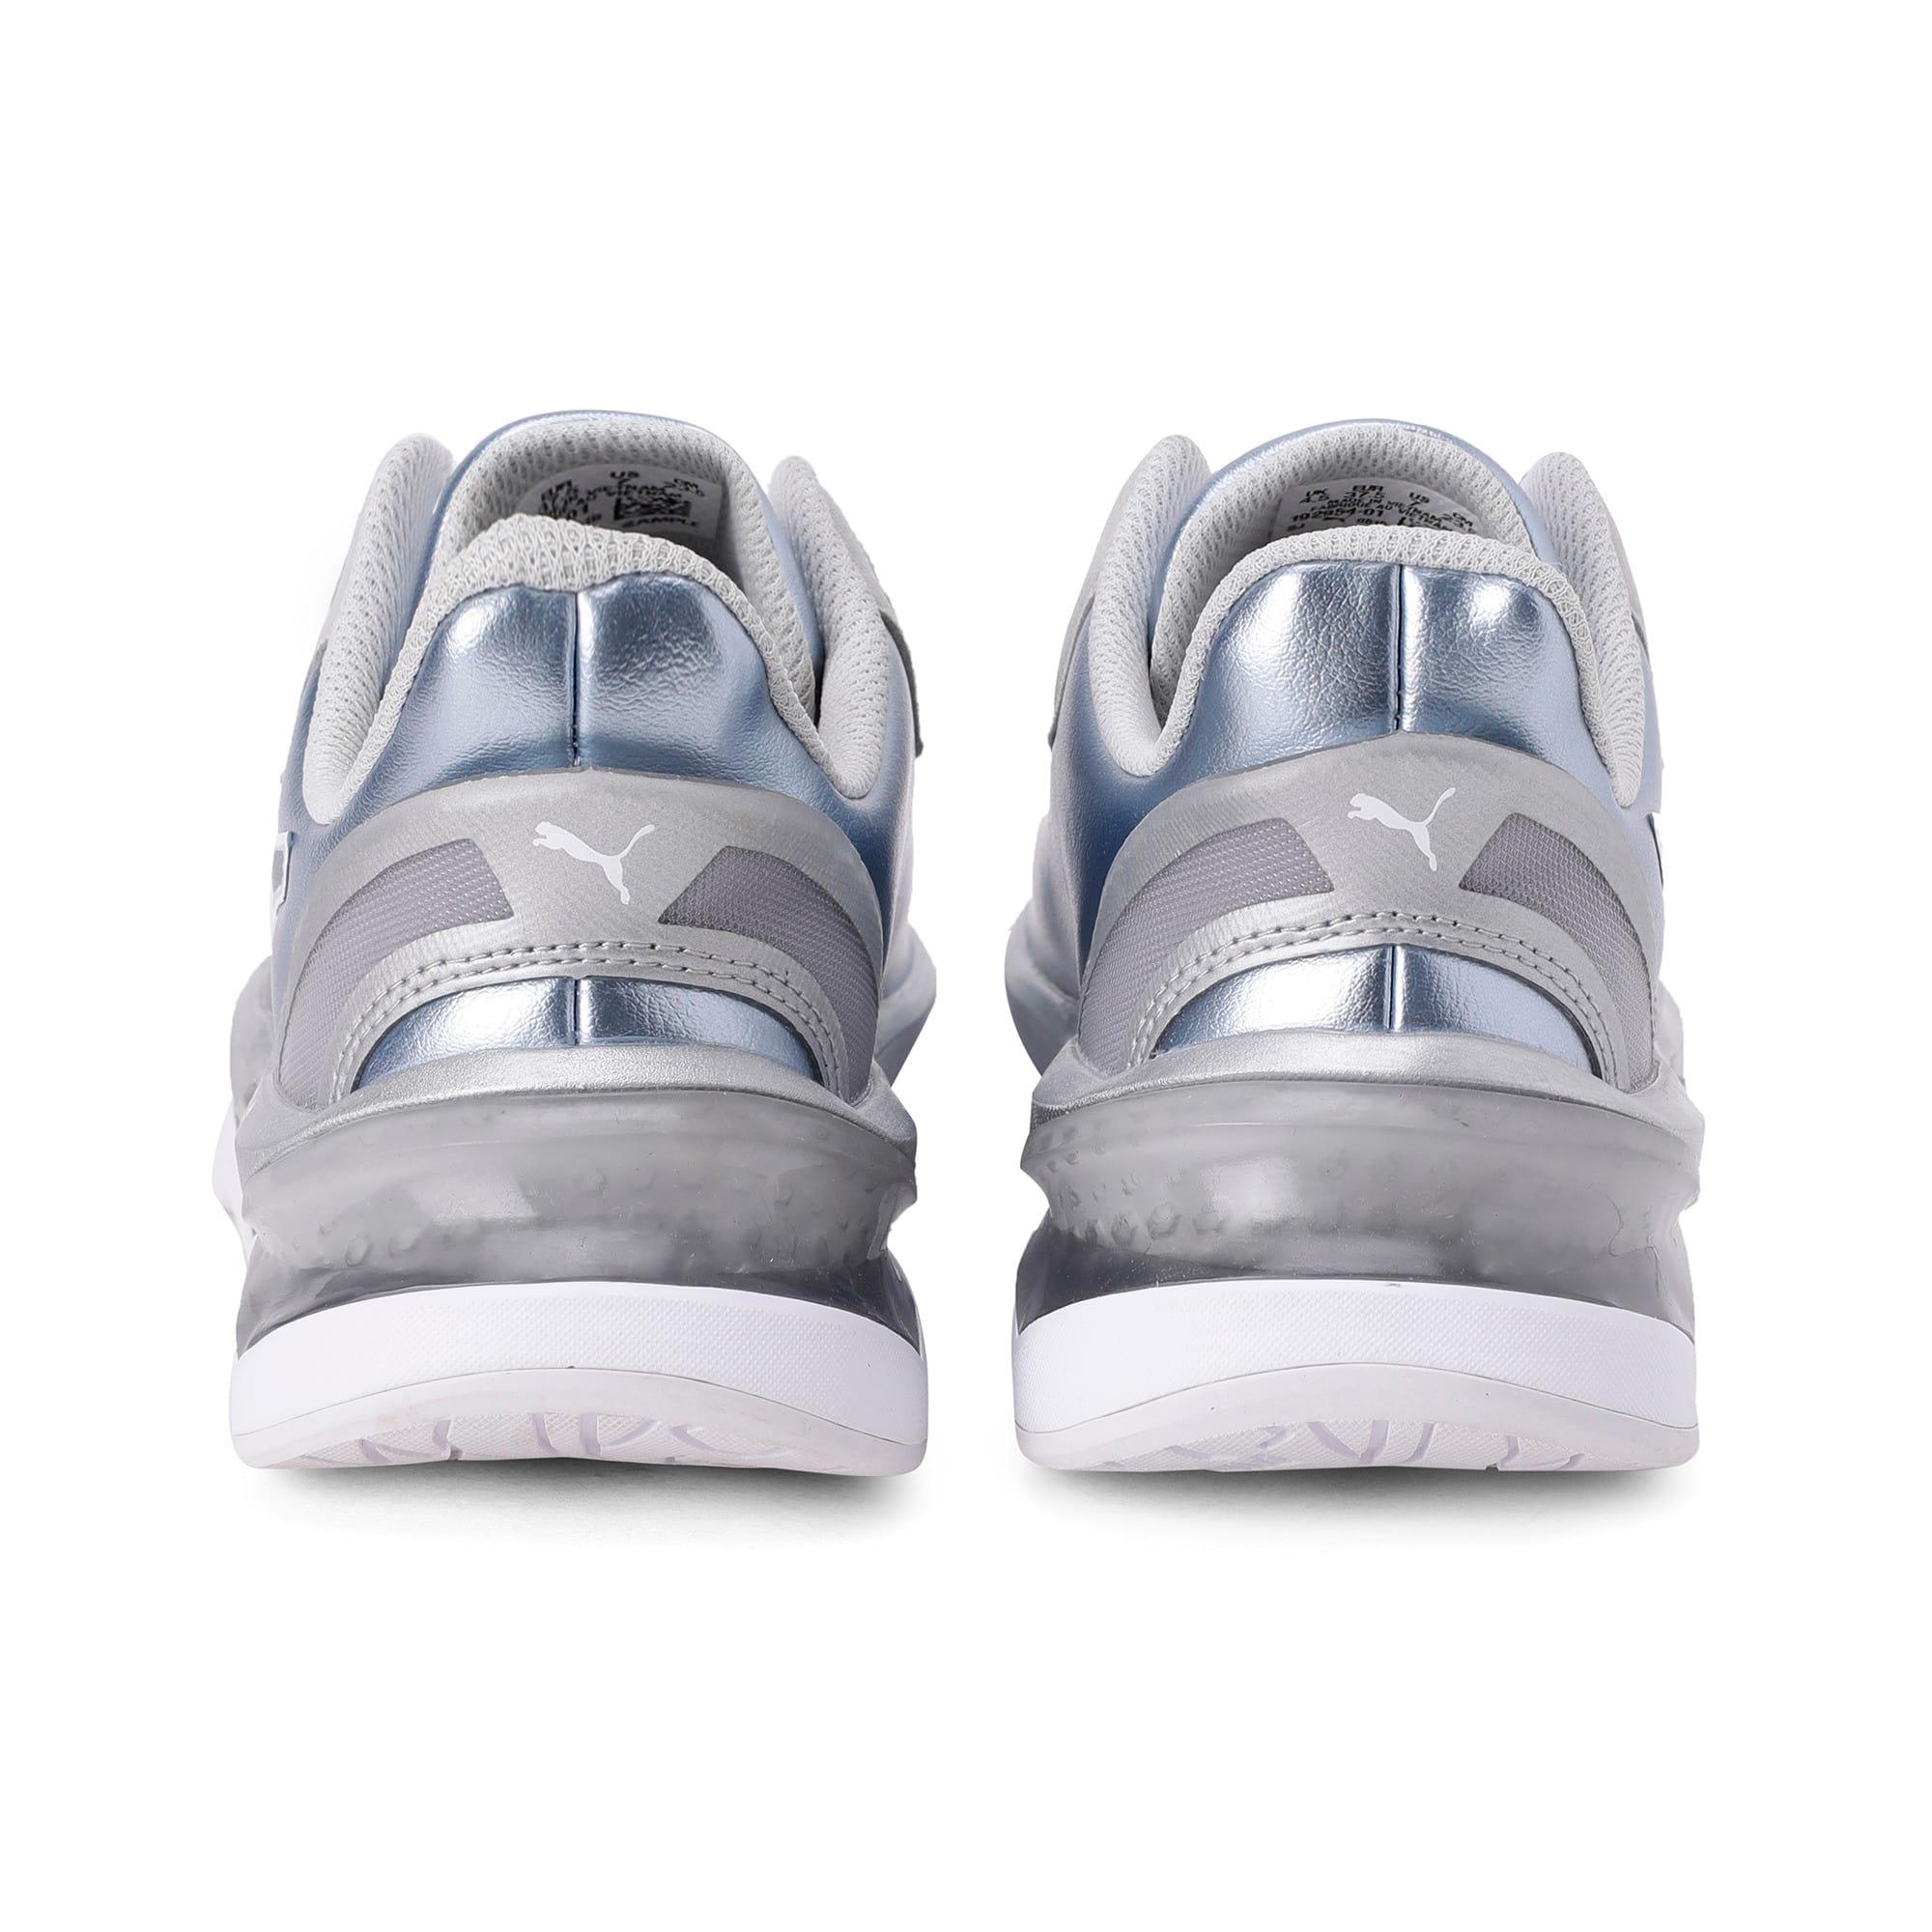 Thumbnail 3 of LQDCELL Shatter XT Metal Women's Training Shoes, Puma Silver-Puma White, medium